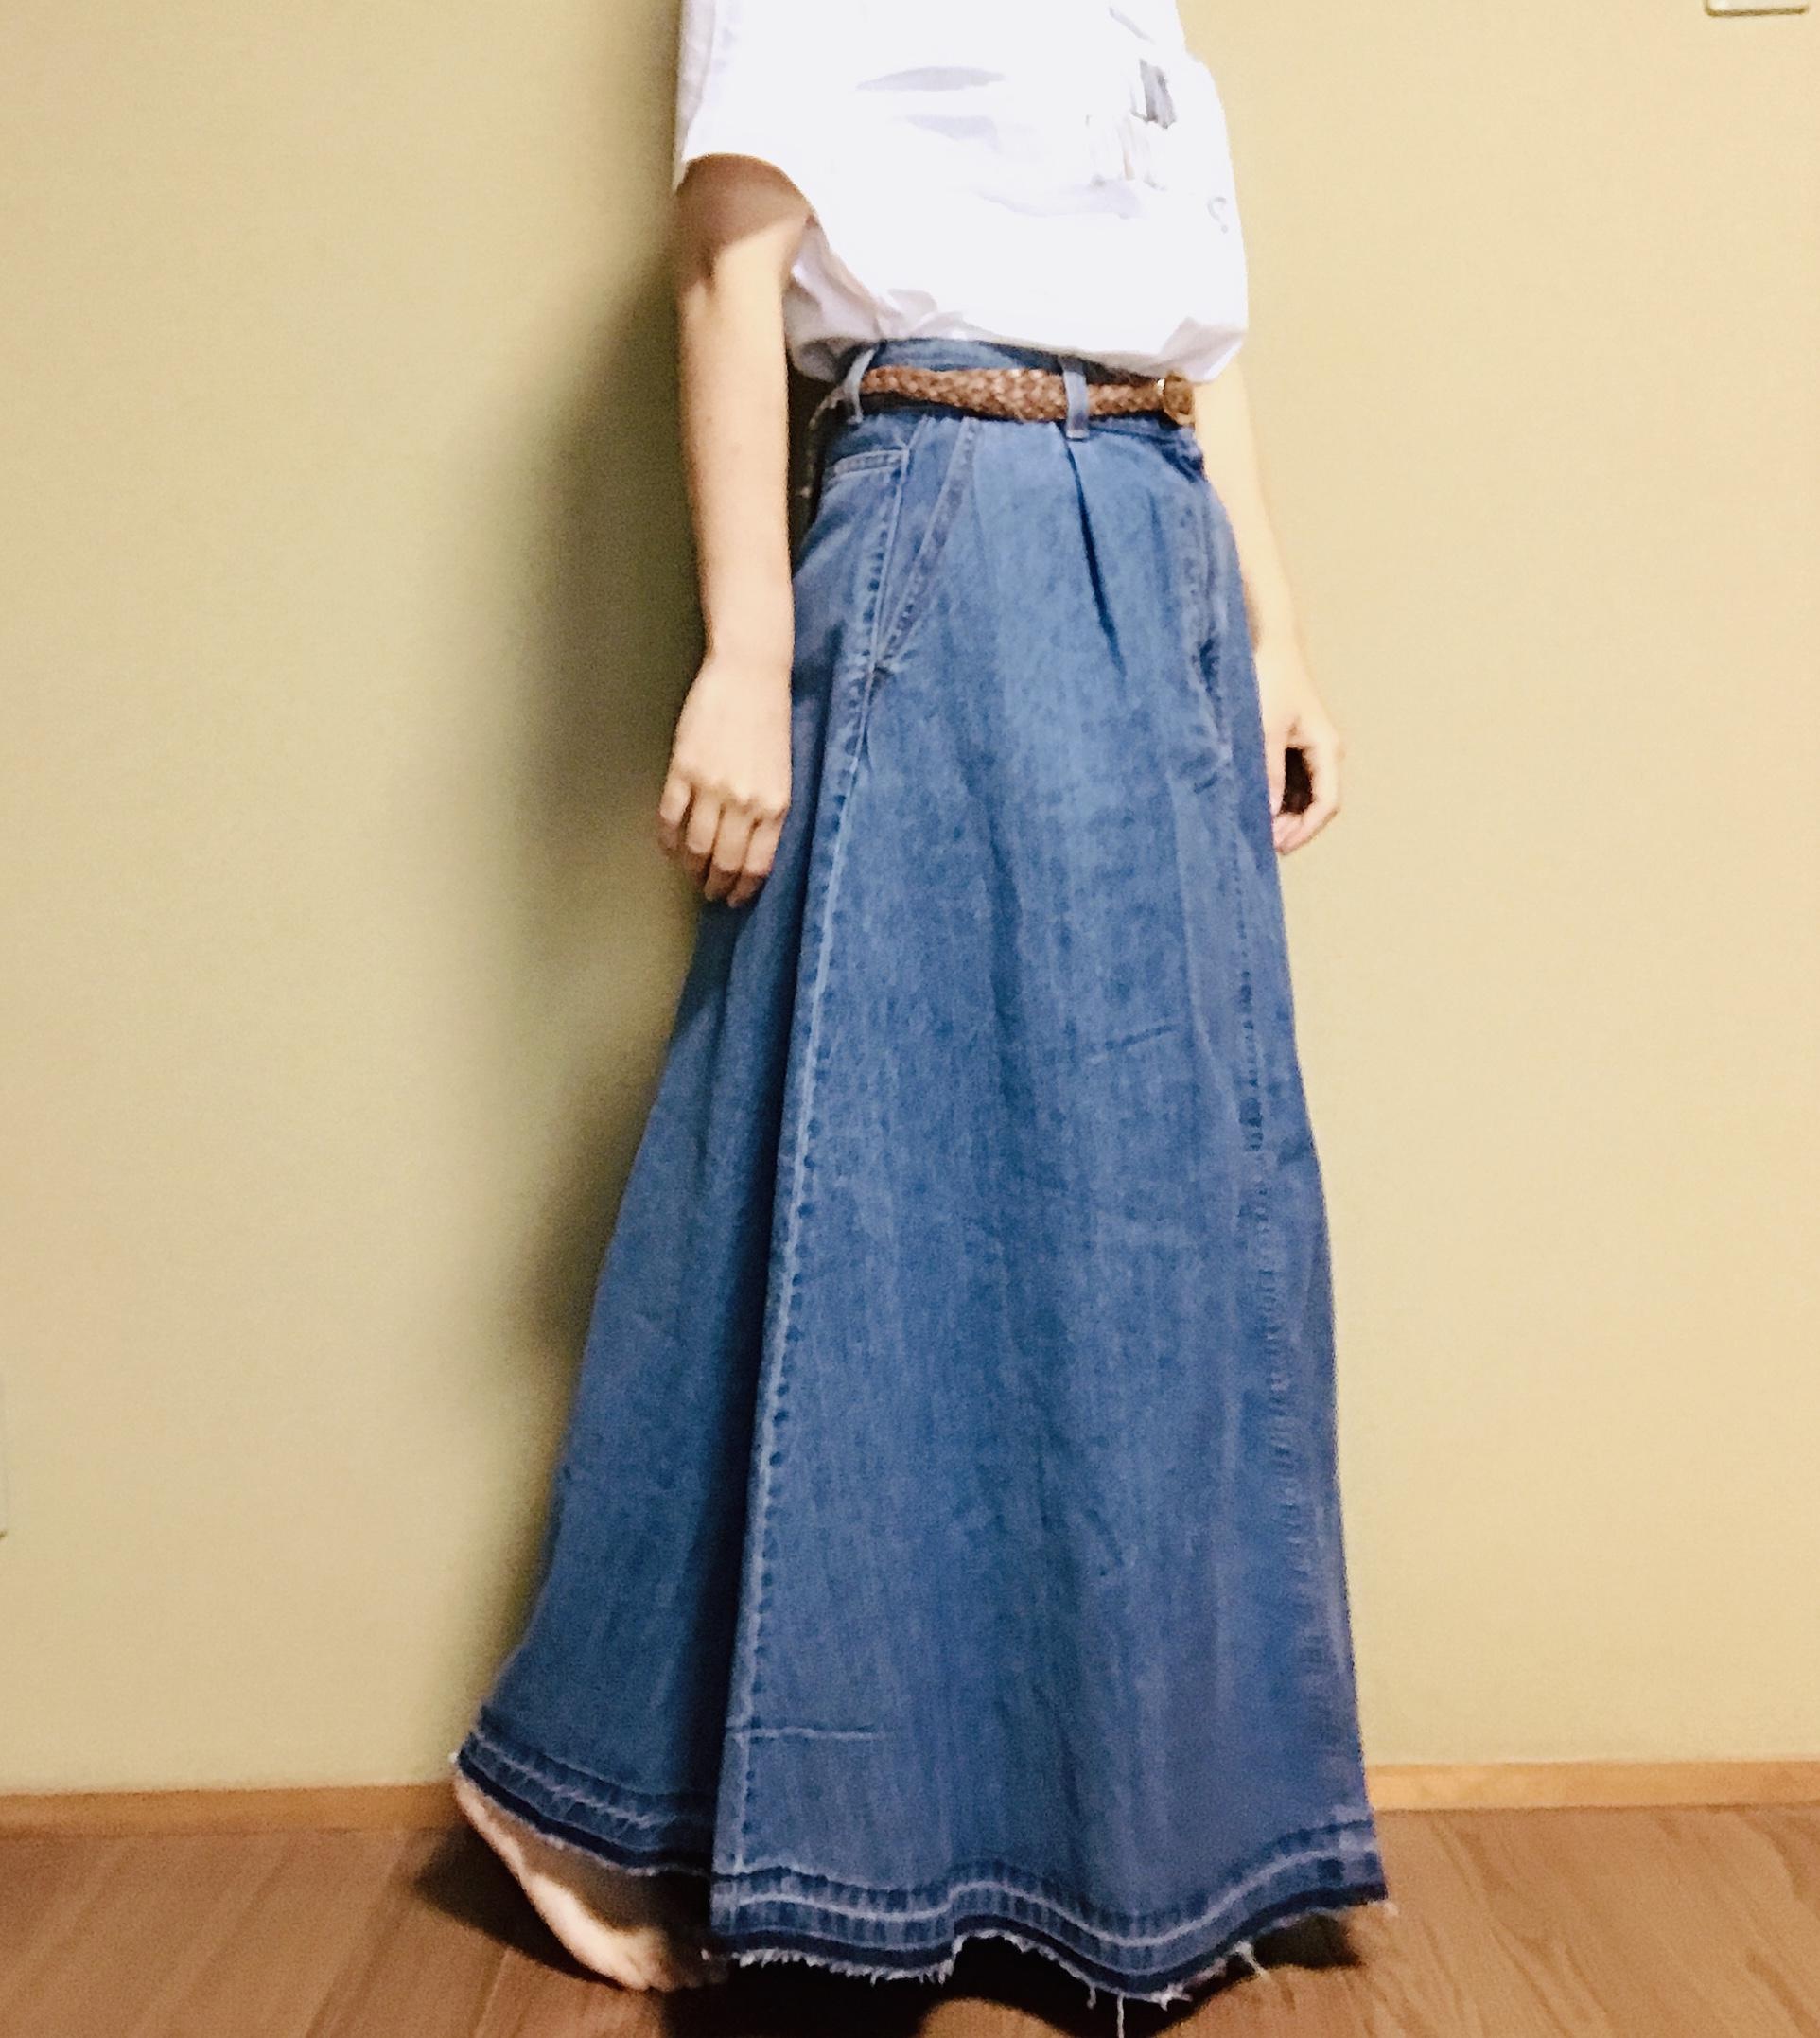 【GU】SNSで話題沸騰#神デニムアイテム!今春大注目《デニムフレアマキシスカート》は絶対買い♡_4